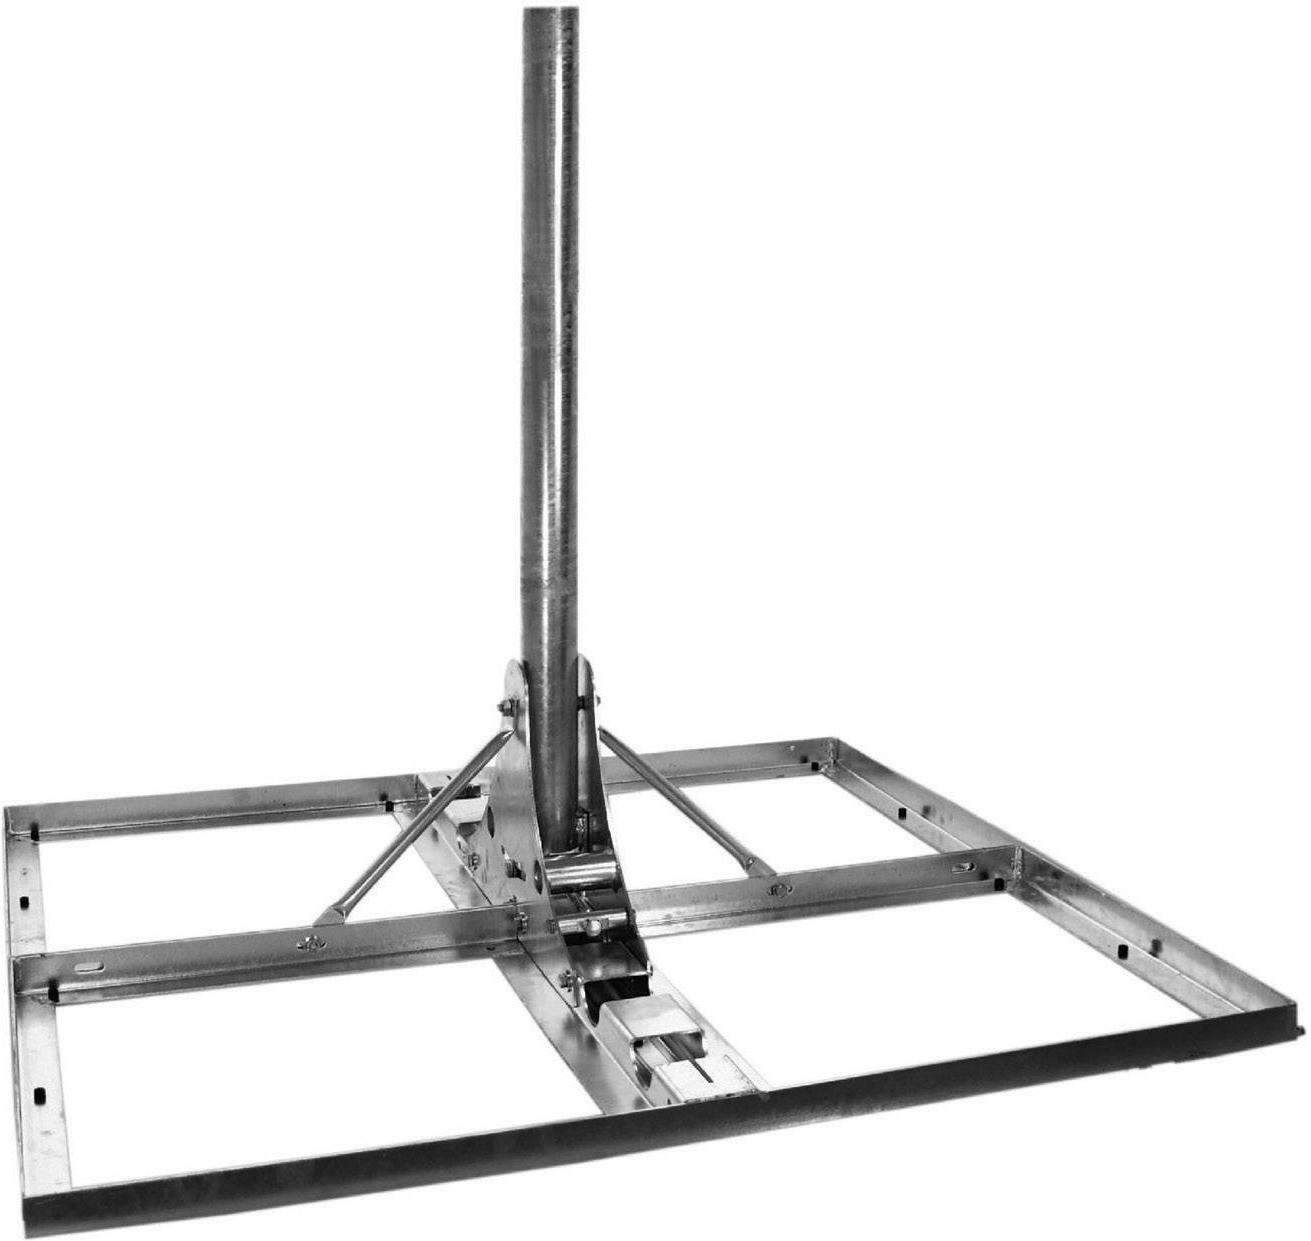 A.S. SAT Terrassenständer Goliat 4x50x50cm 10°